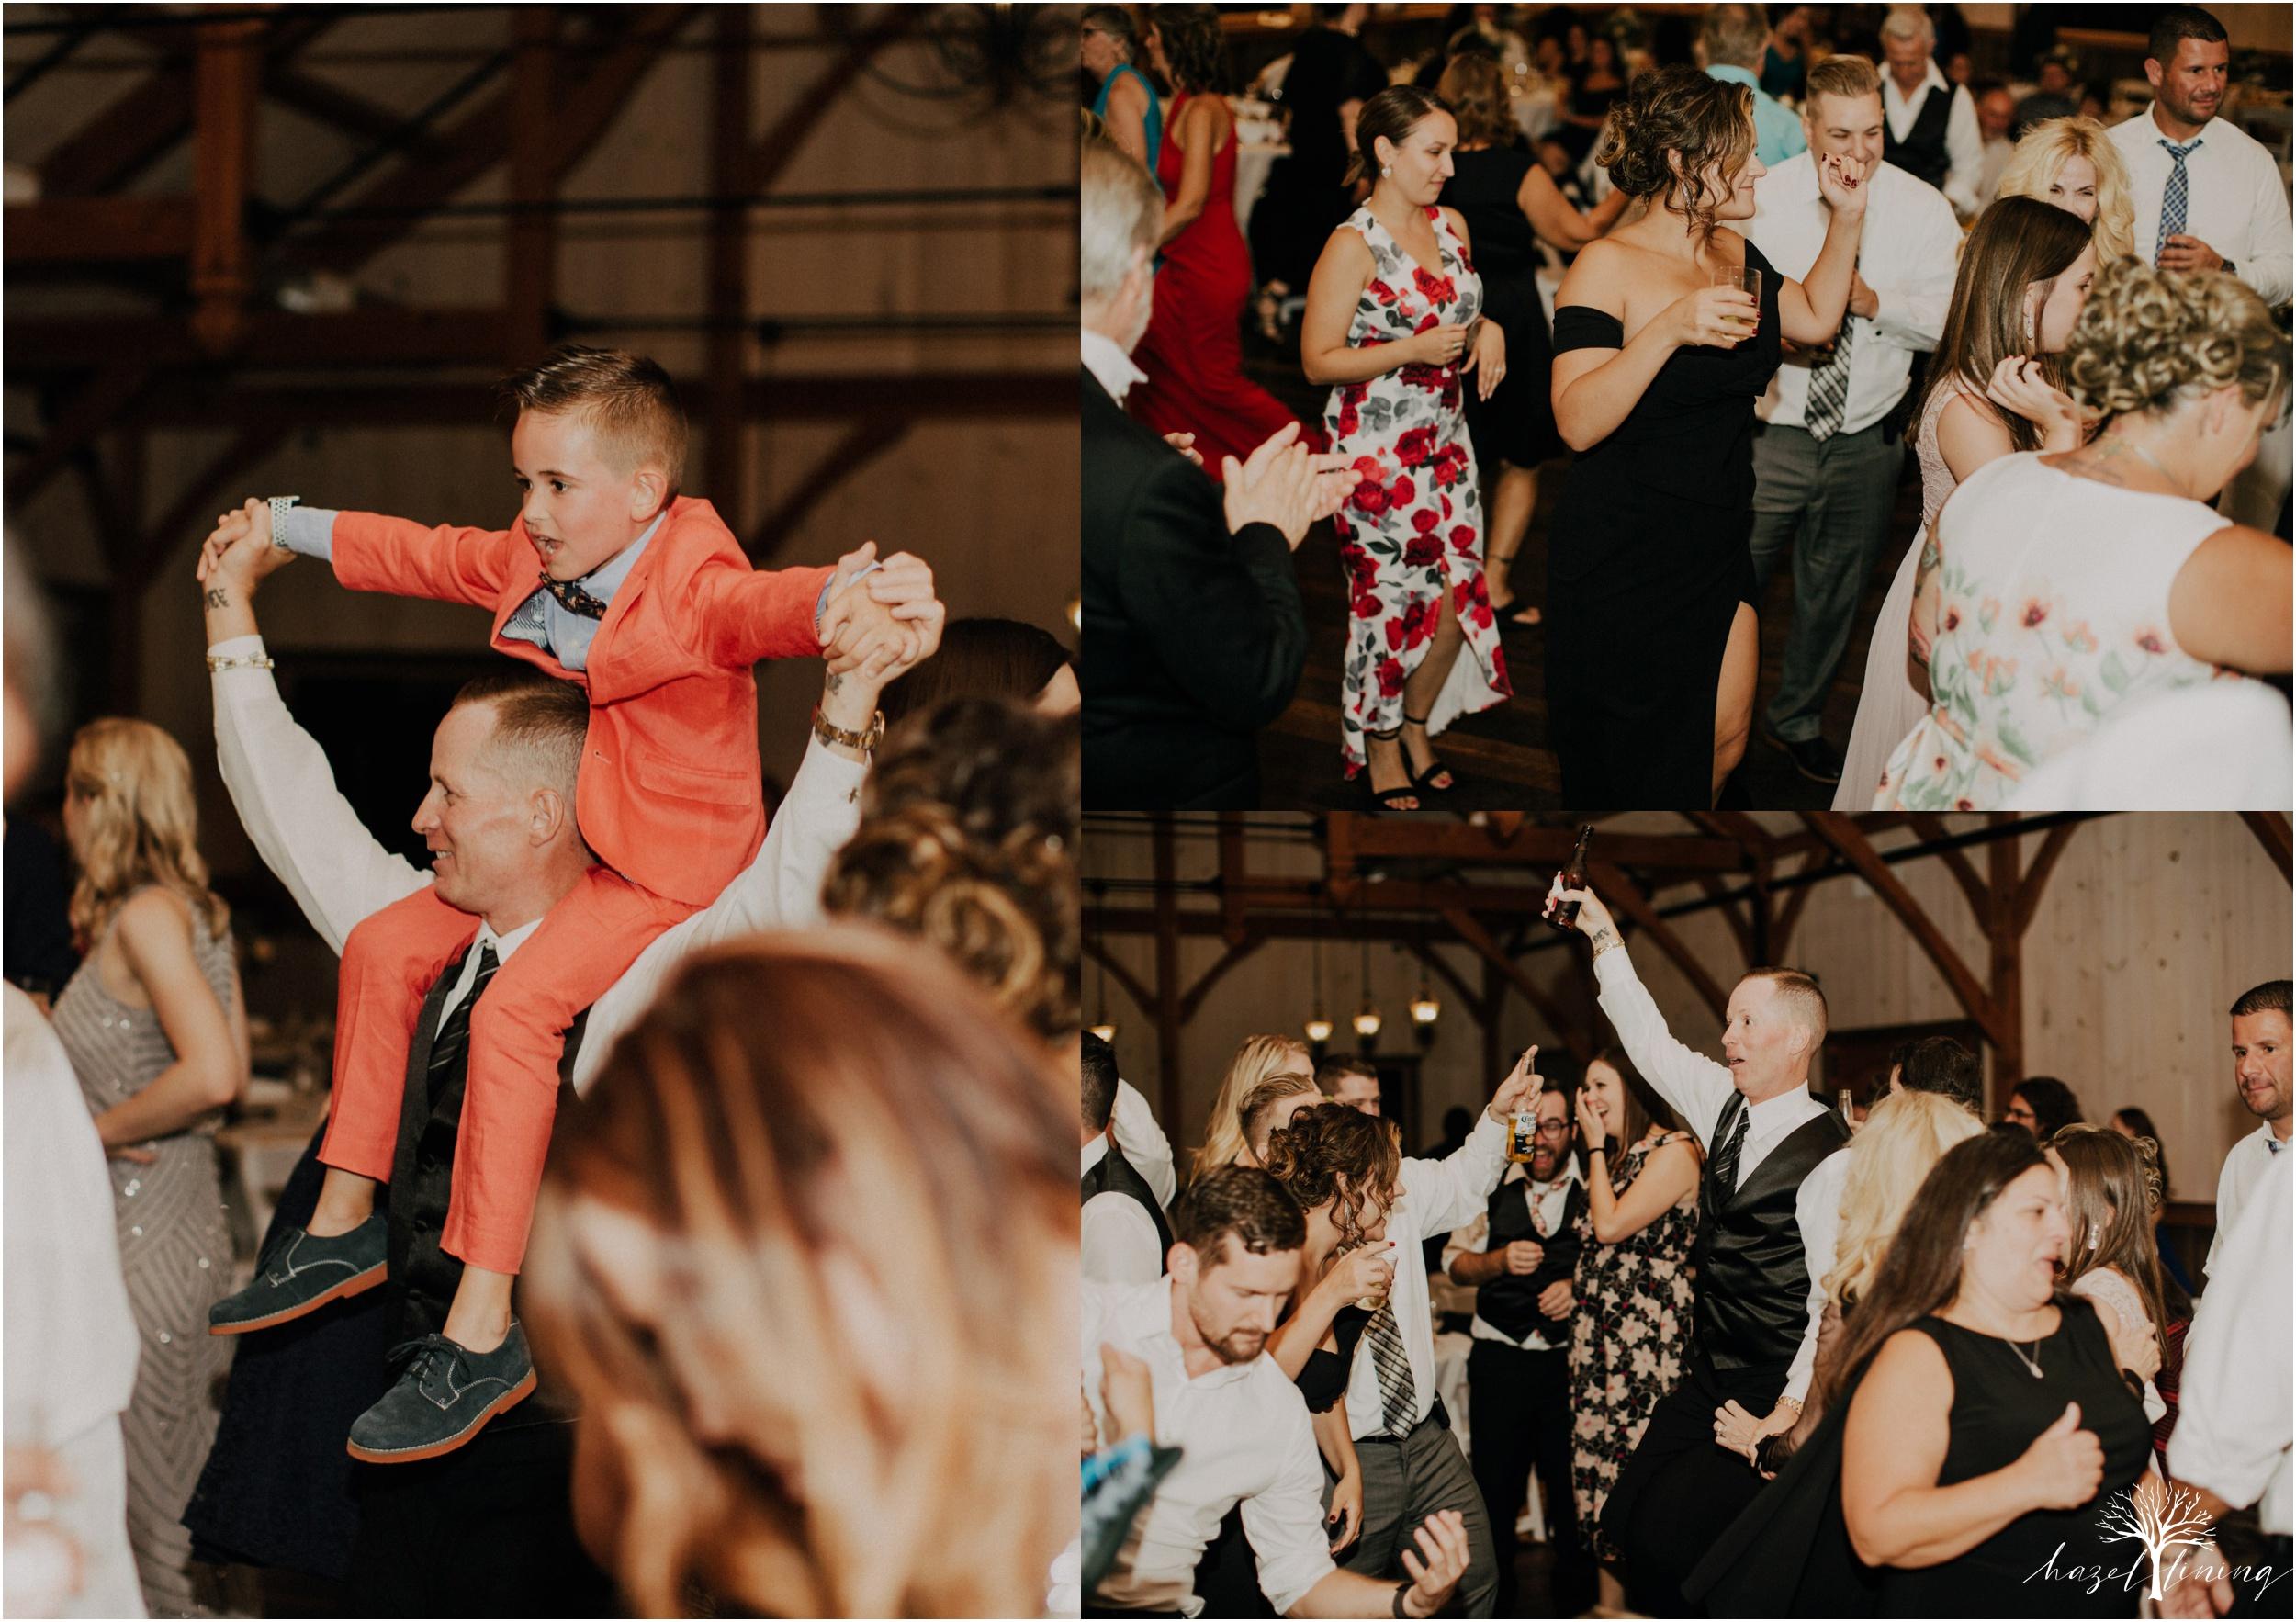 maureen-hepner-anthony-giordano-rose-bank-winery-newtow-pennsylvania-luxury-summer-wedding-hazel-lining-photography-destination-elopement-wedding-engagement-photography_0150.jpg